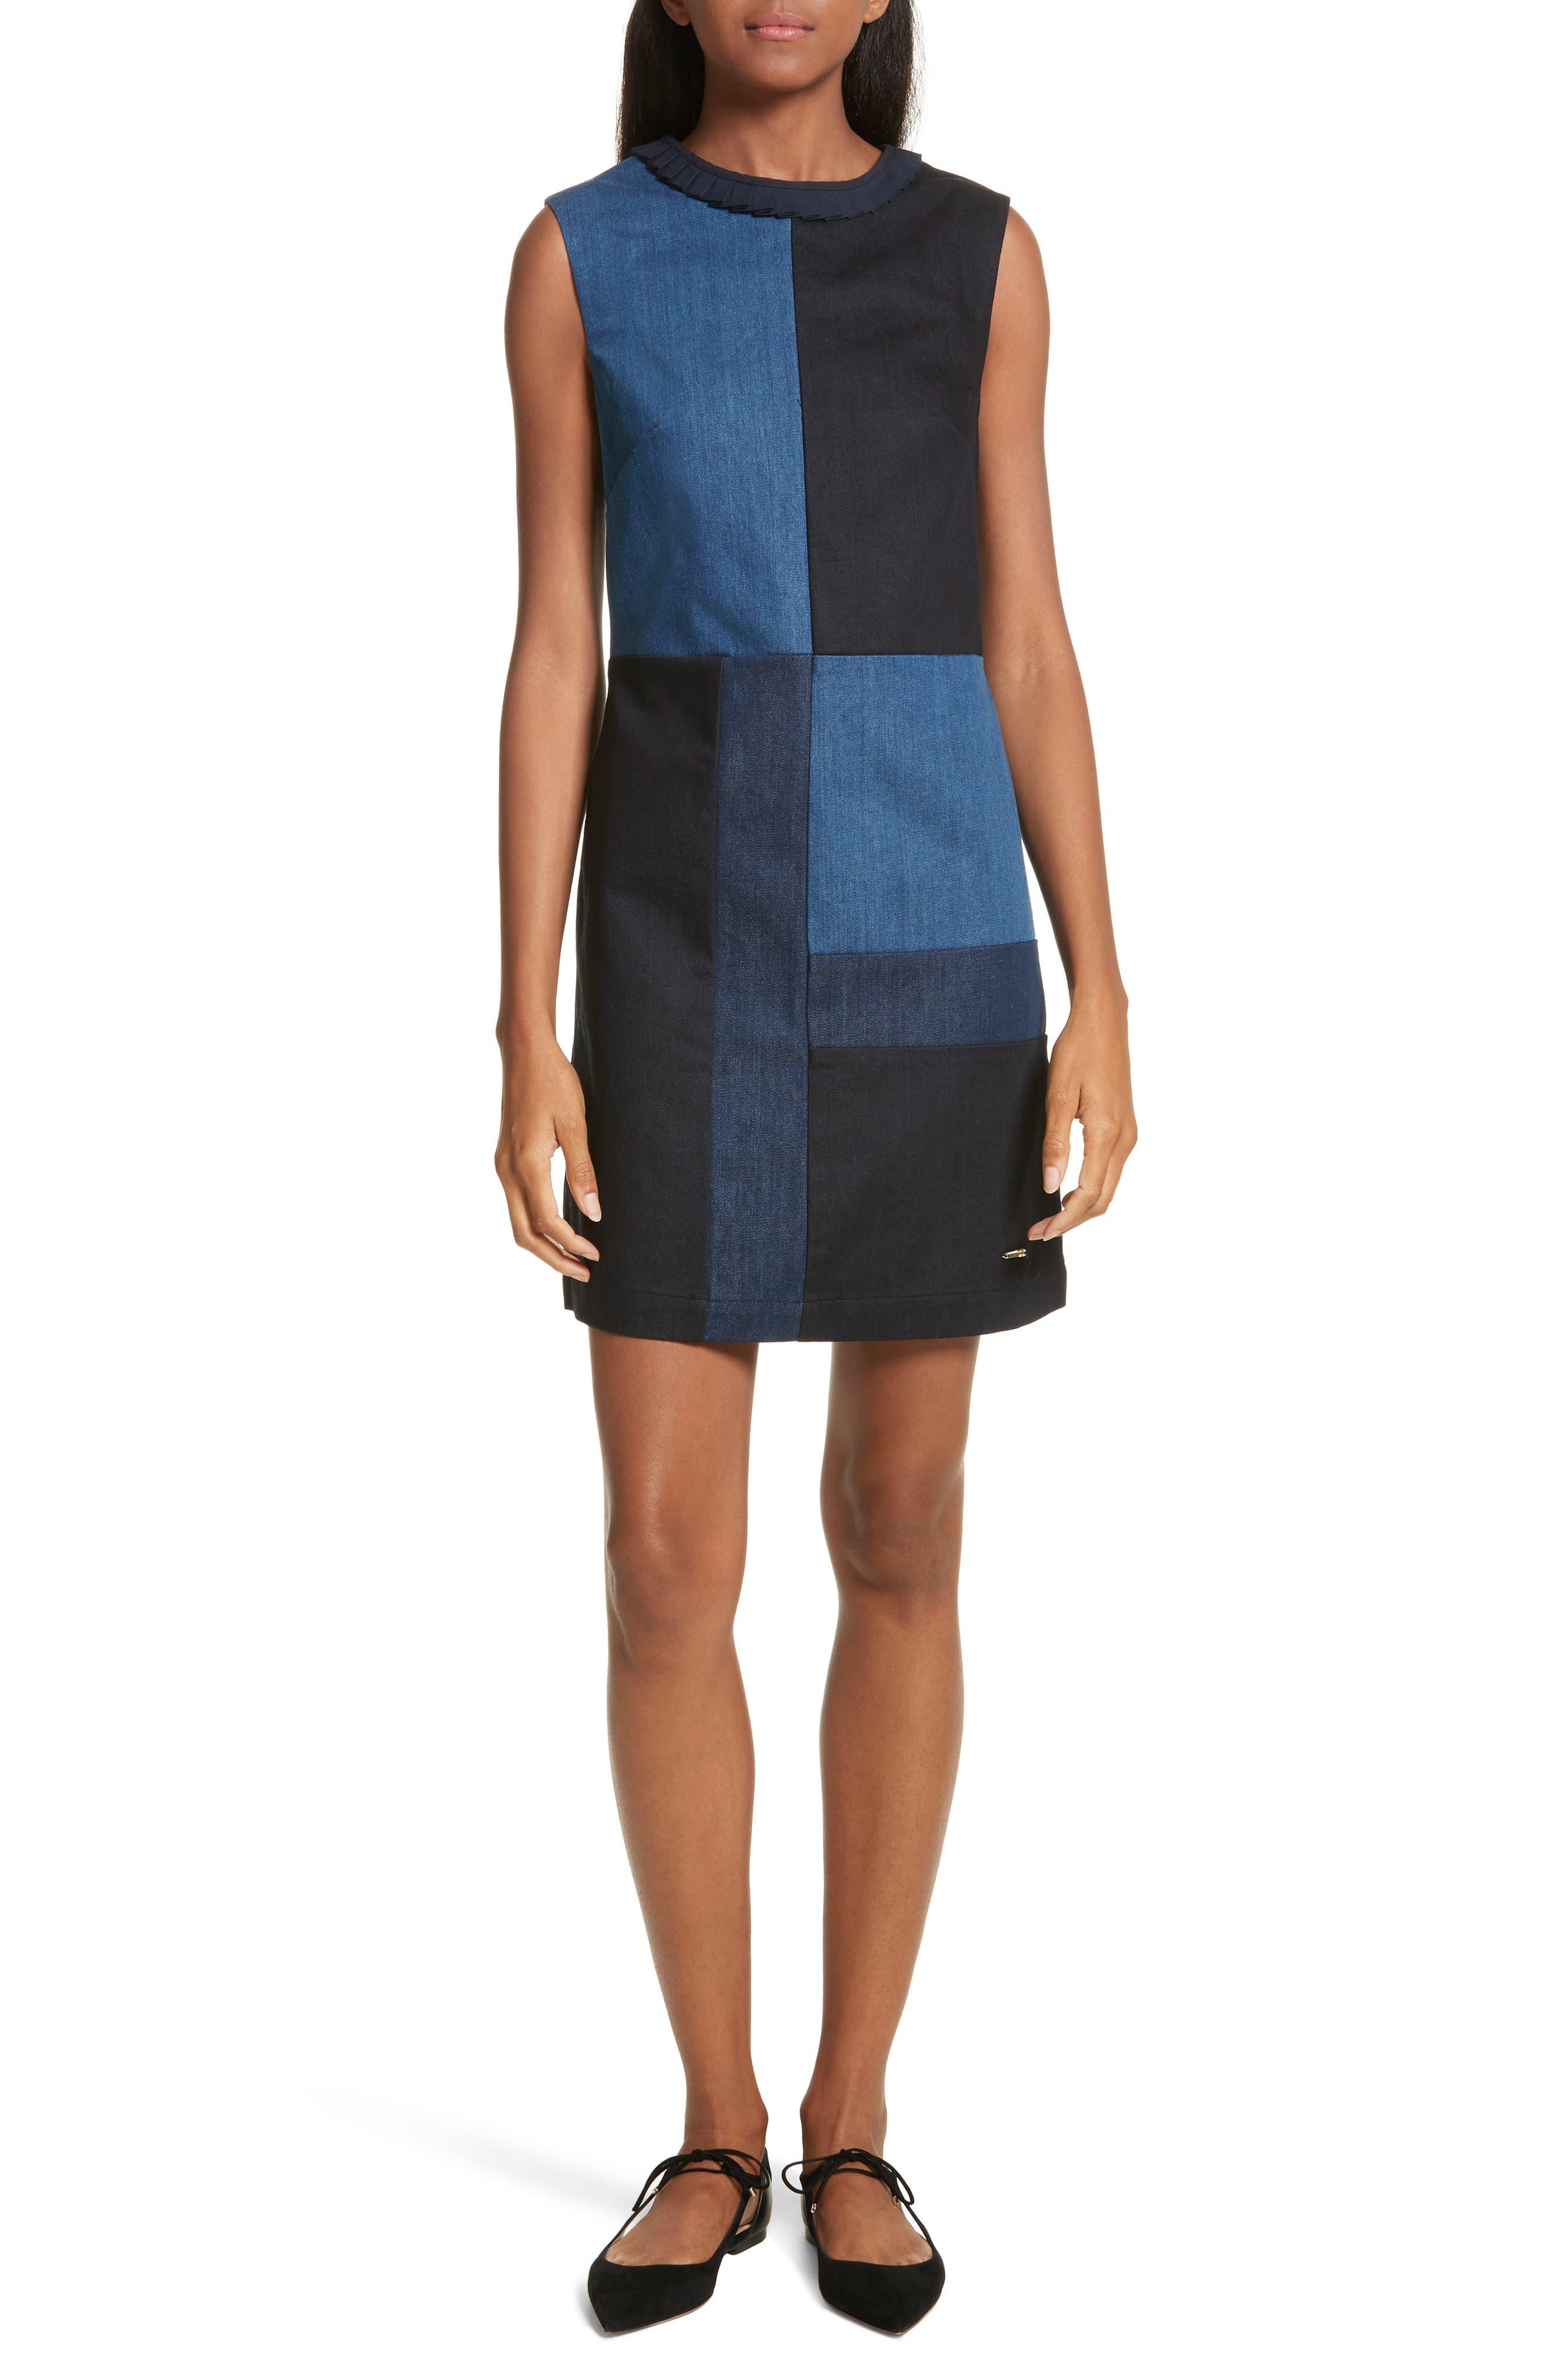 Ted Baker Morfee London Colorblock Denim A-Line Dress,                             Main thumbnail 1, color,                             Mid Wash